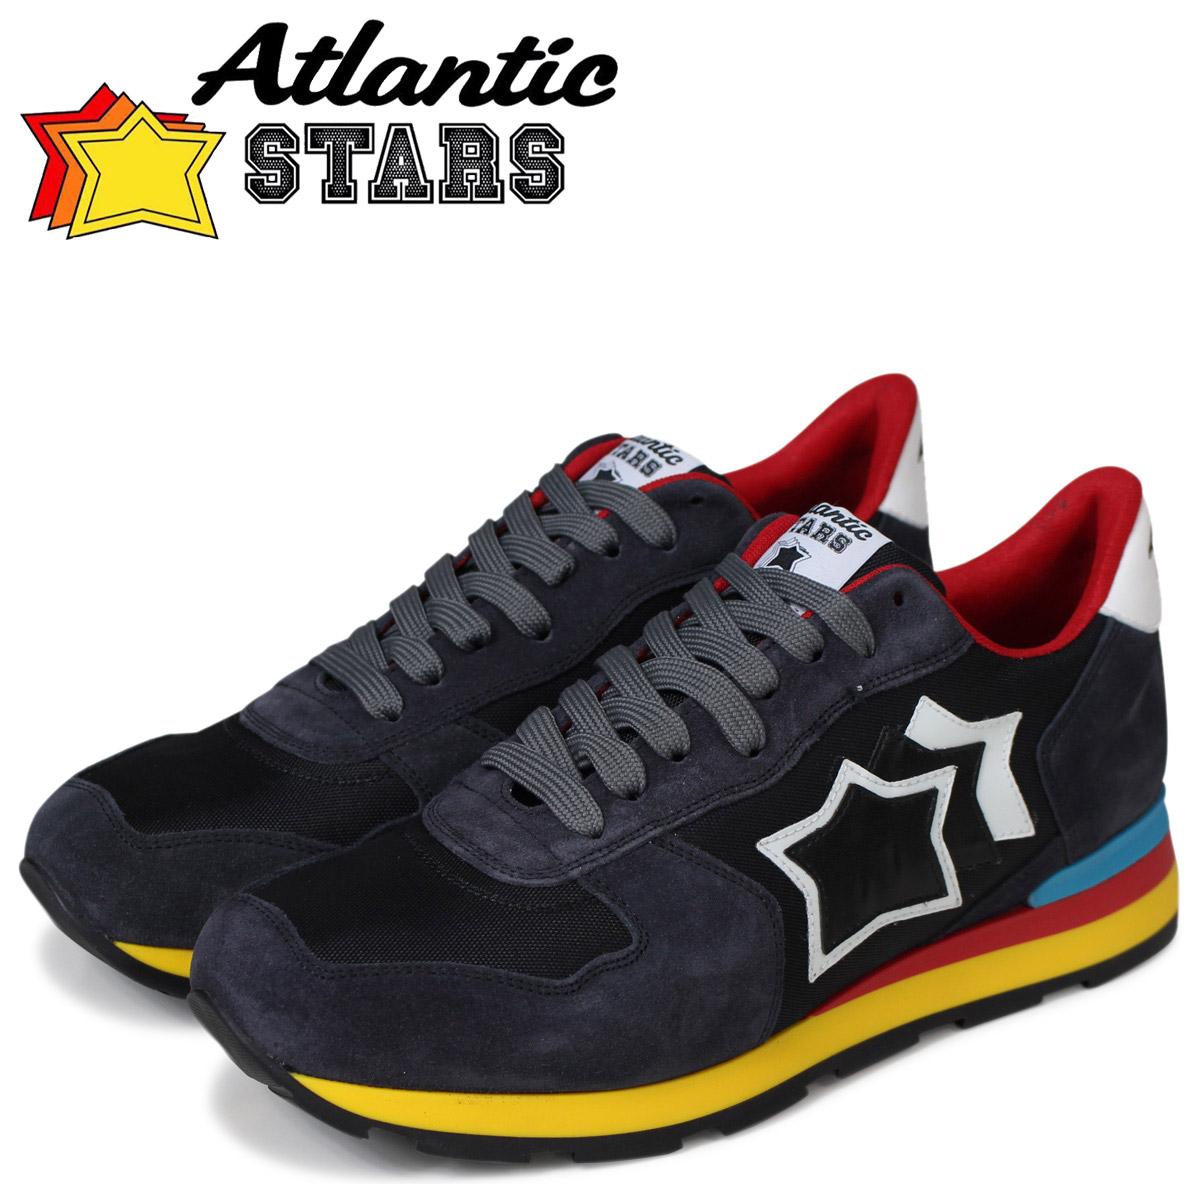 Atlantic STARS メンズ スニーカー アトランティックスターズ アンタレス ANTARES AB-89C ネイビー